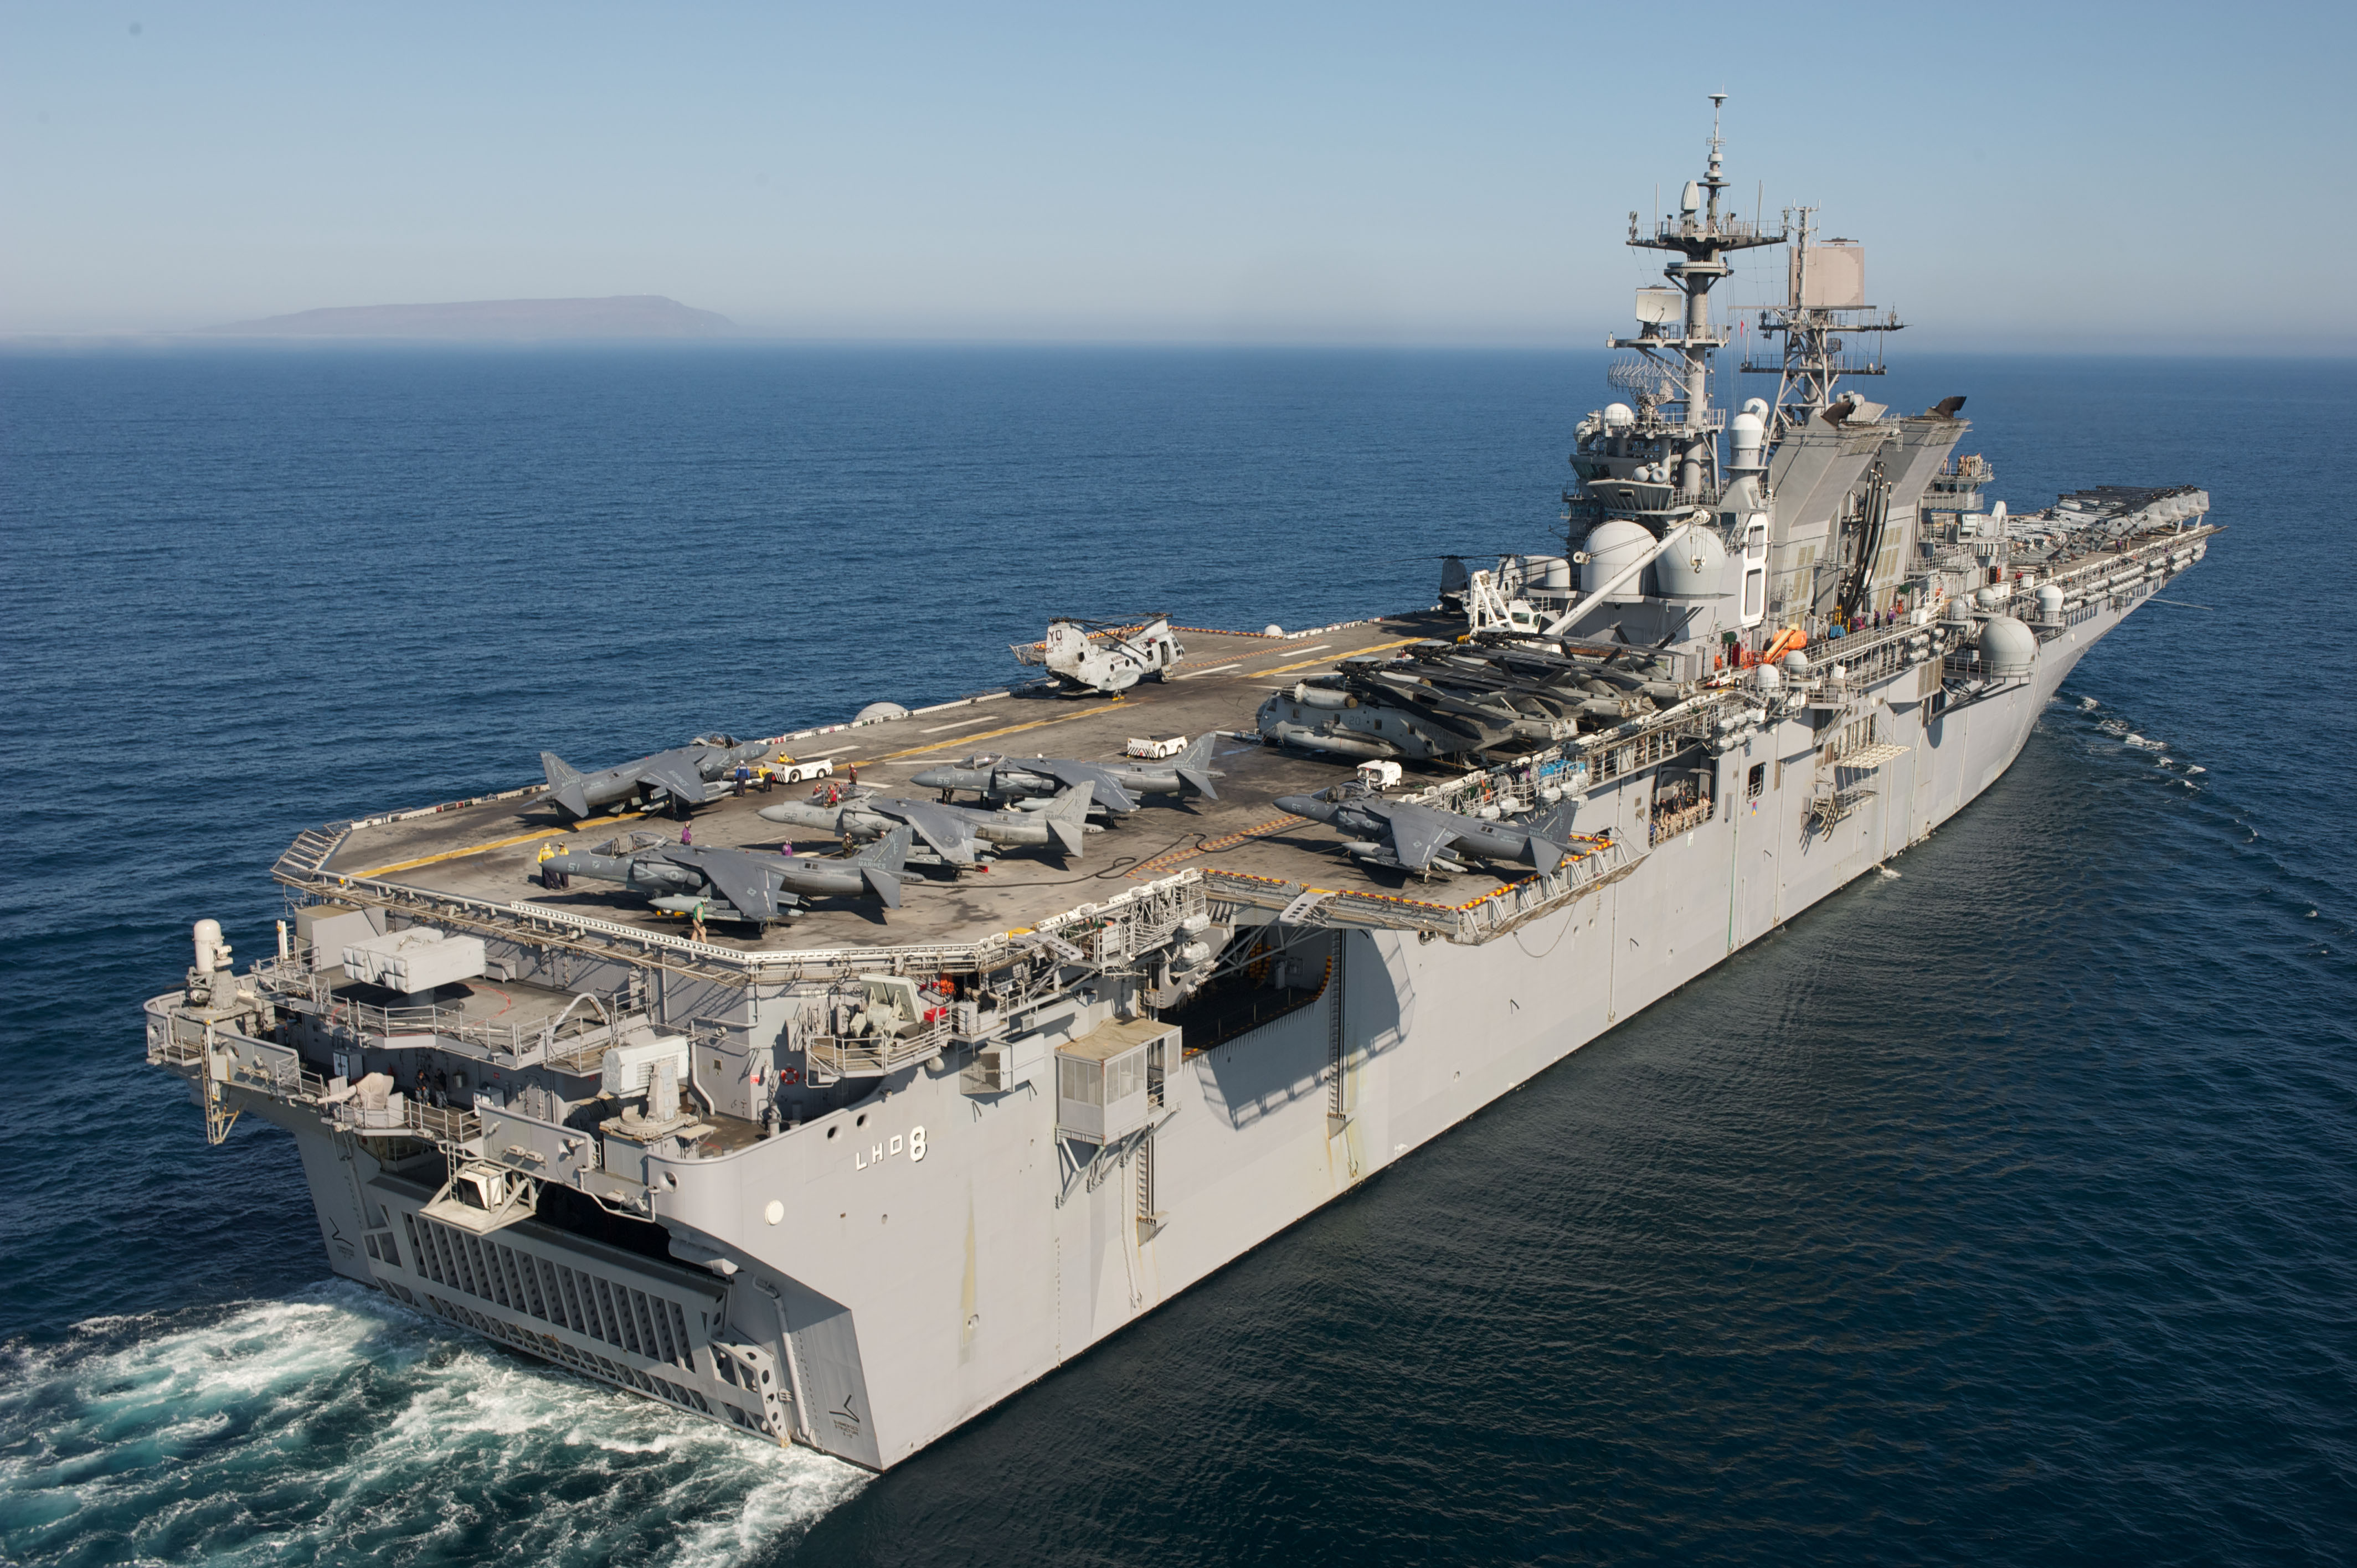 US_Navy_110907-N-KD852-132_The_amphibious_assault_ship_USS_Makin_Island_%28LHD_8%29_transits_off_the_coast_of_Southern_California_conducting_flight_ope.jpg